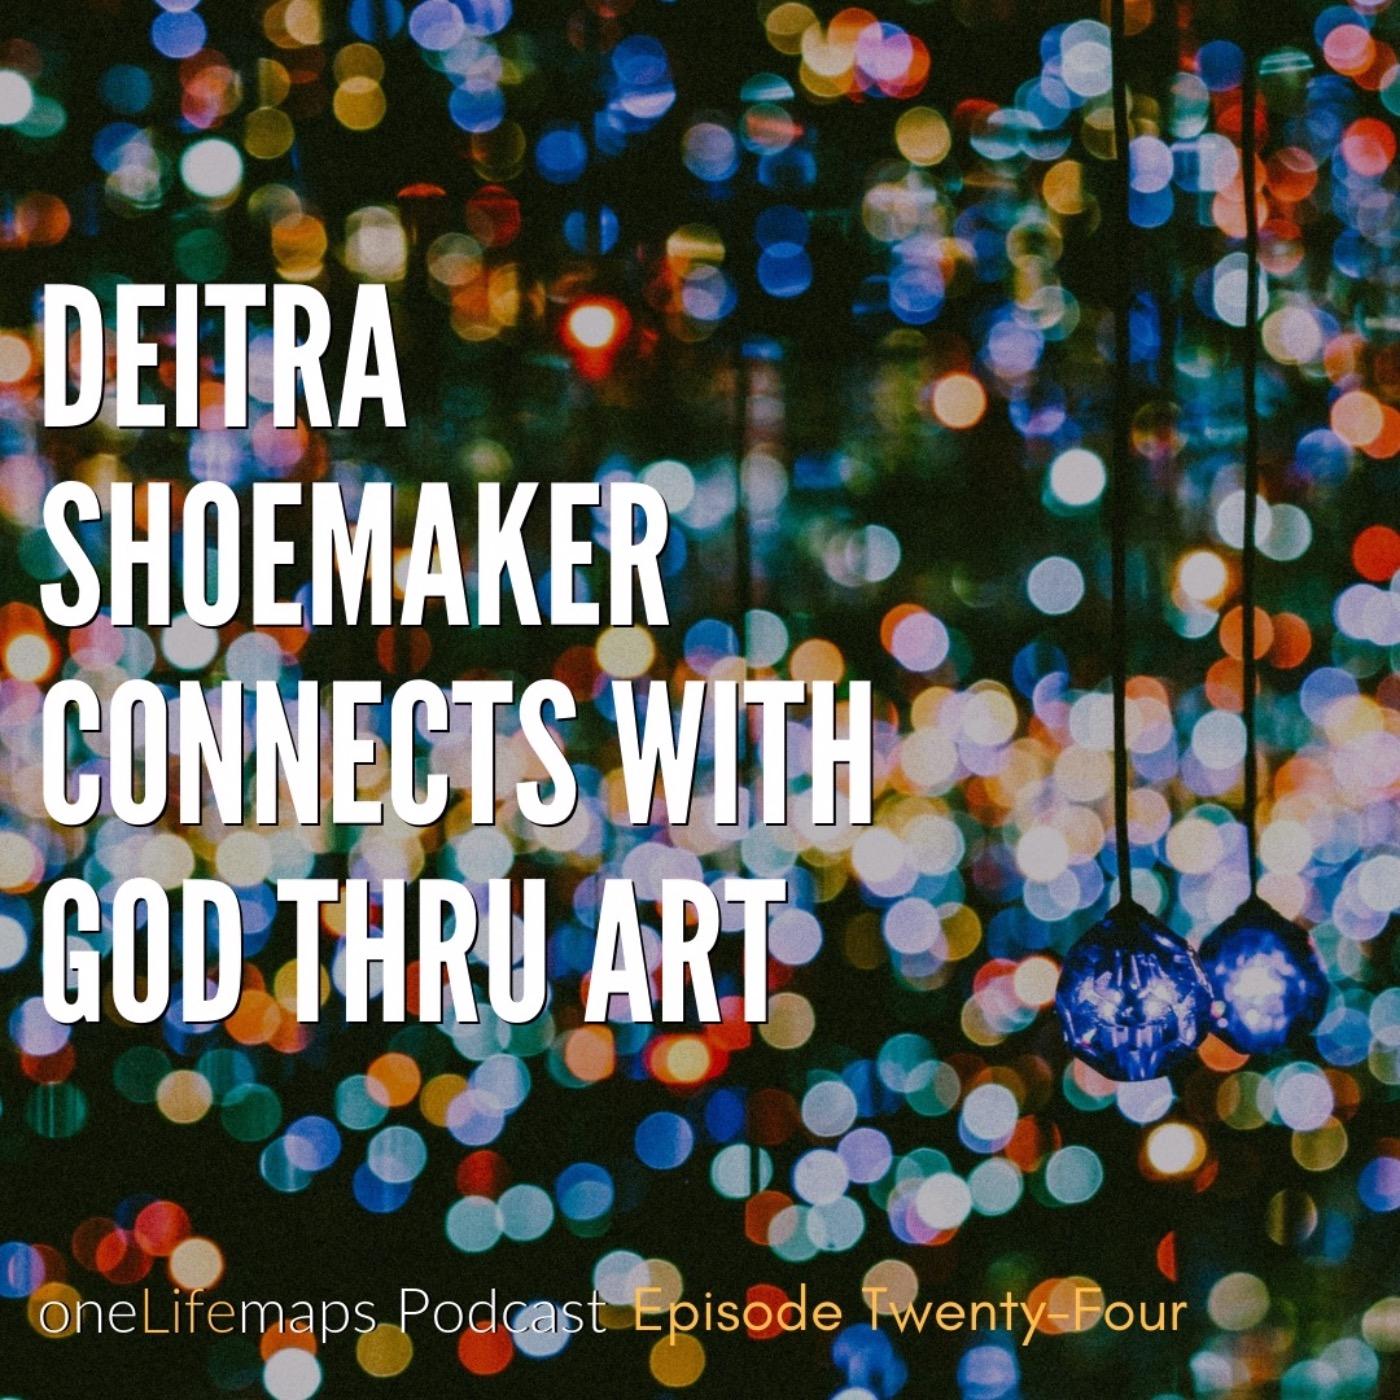 Deitra Shoemaker Connects with God Thru Art